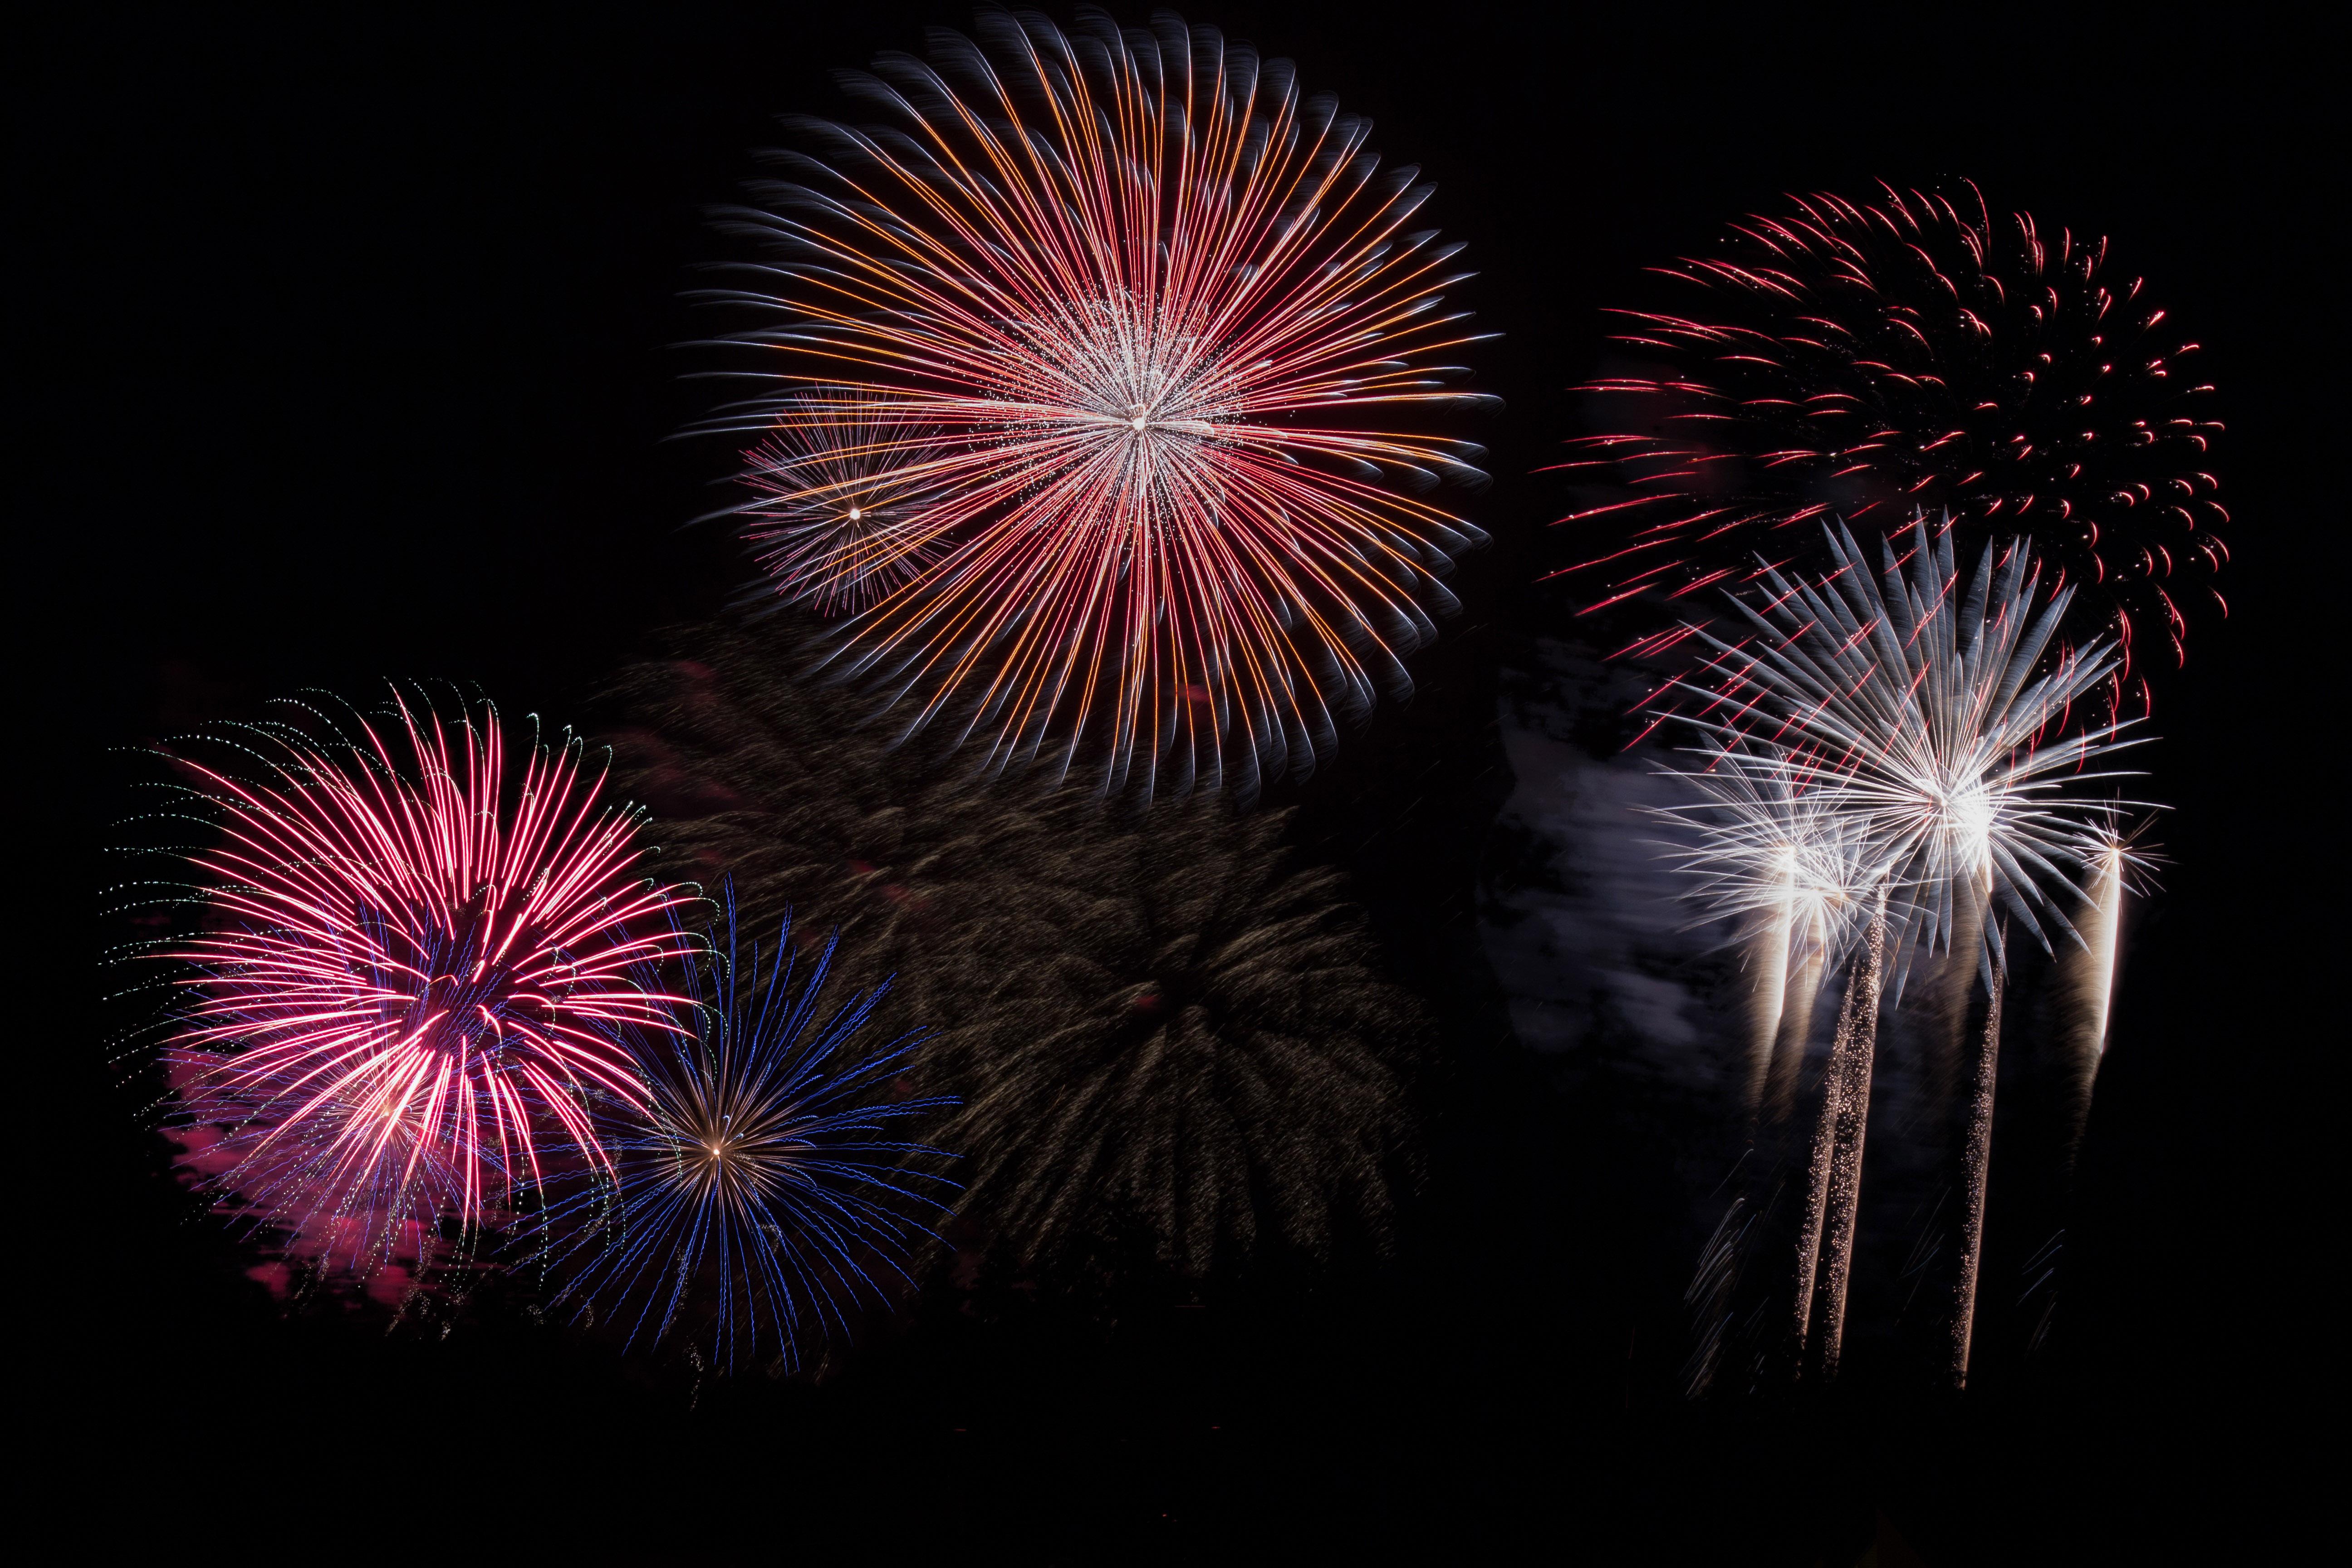 New Year\'s Eve Fireworks Dispay image - Free stock photo - Public ...